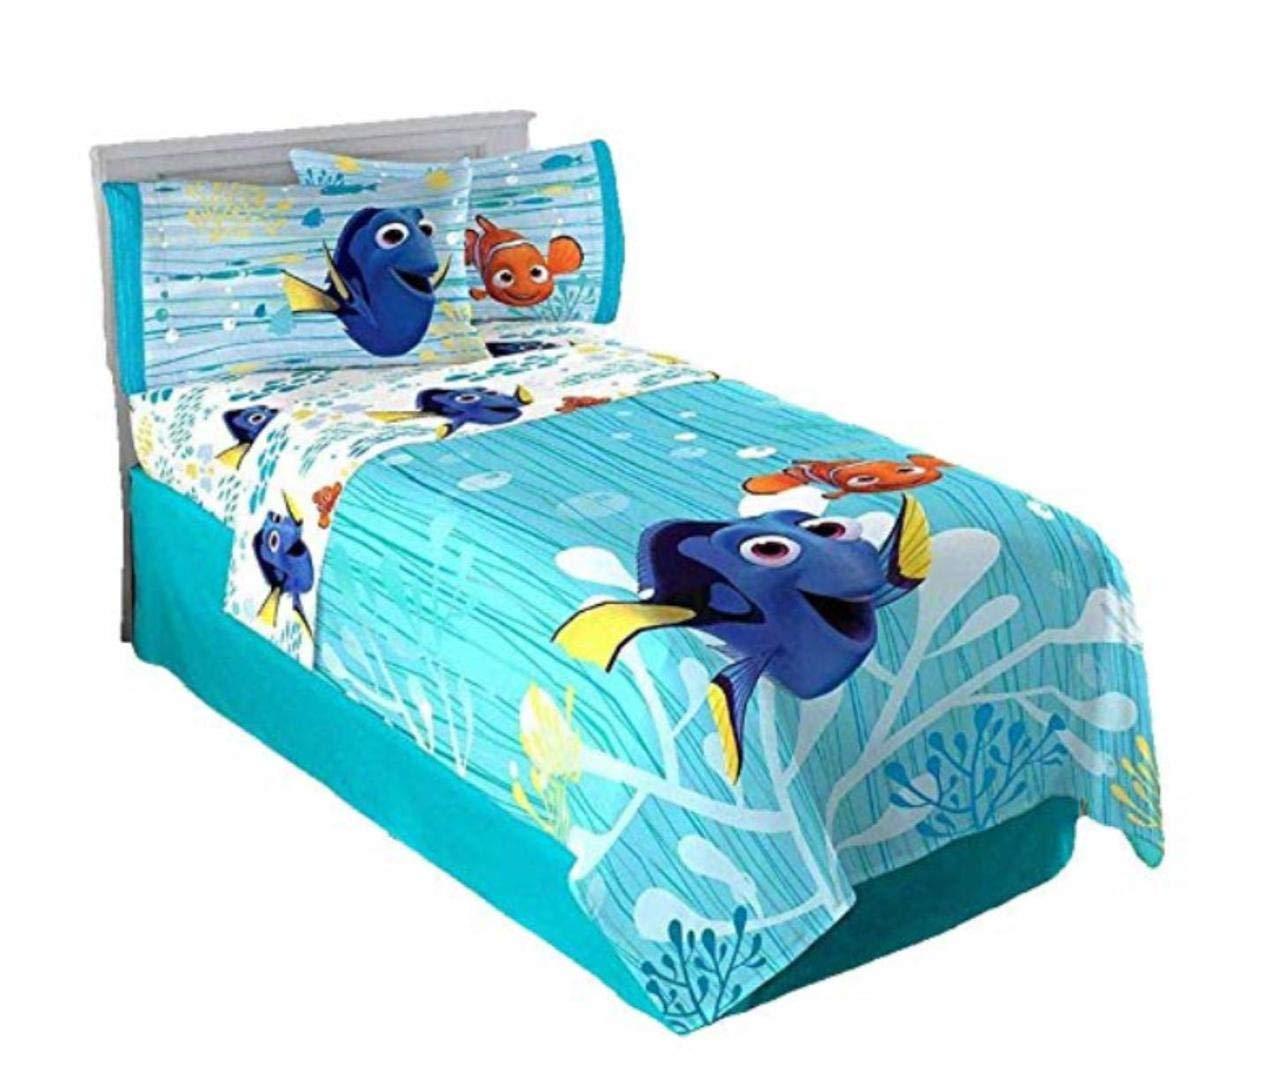 Kids Bedding Set 3 Piece Finding Dory Nemo Bed Sheet Set Twin Size Children Bedroom